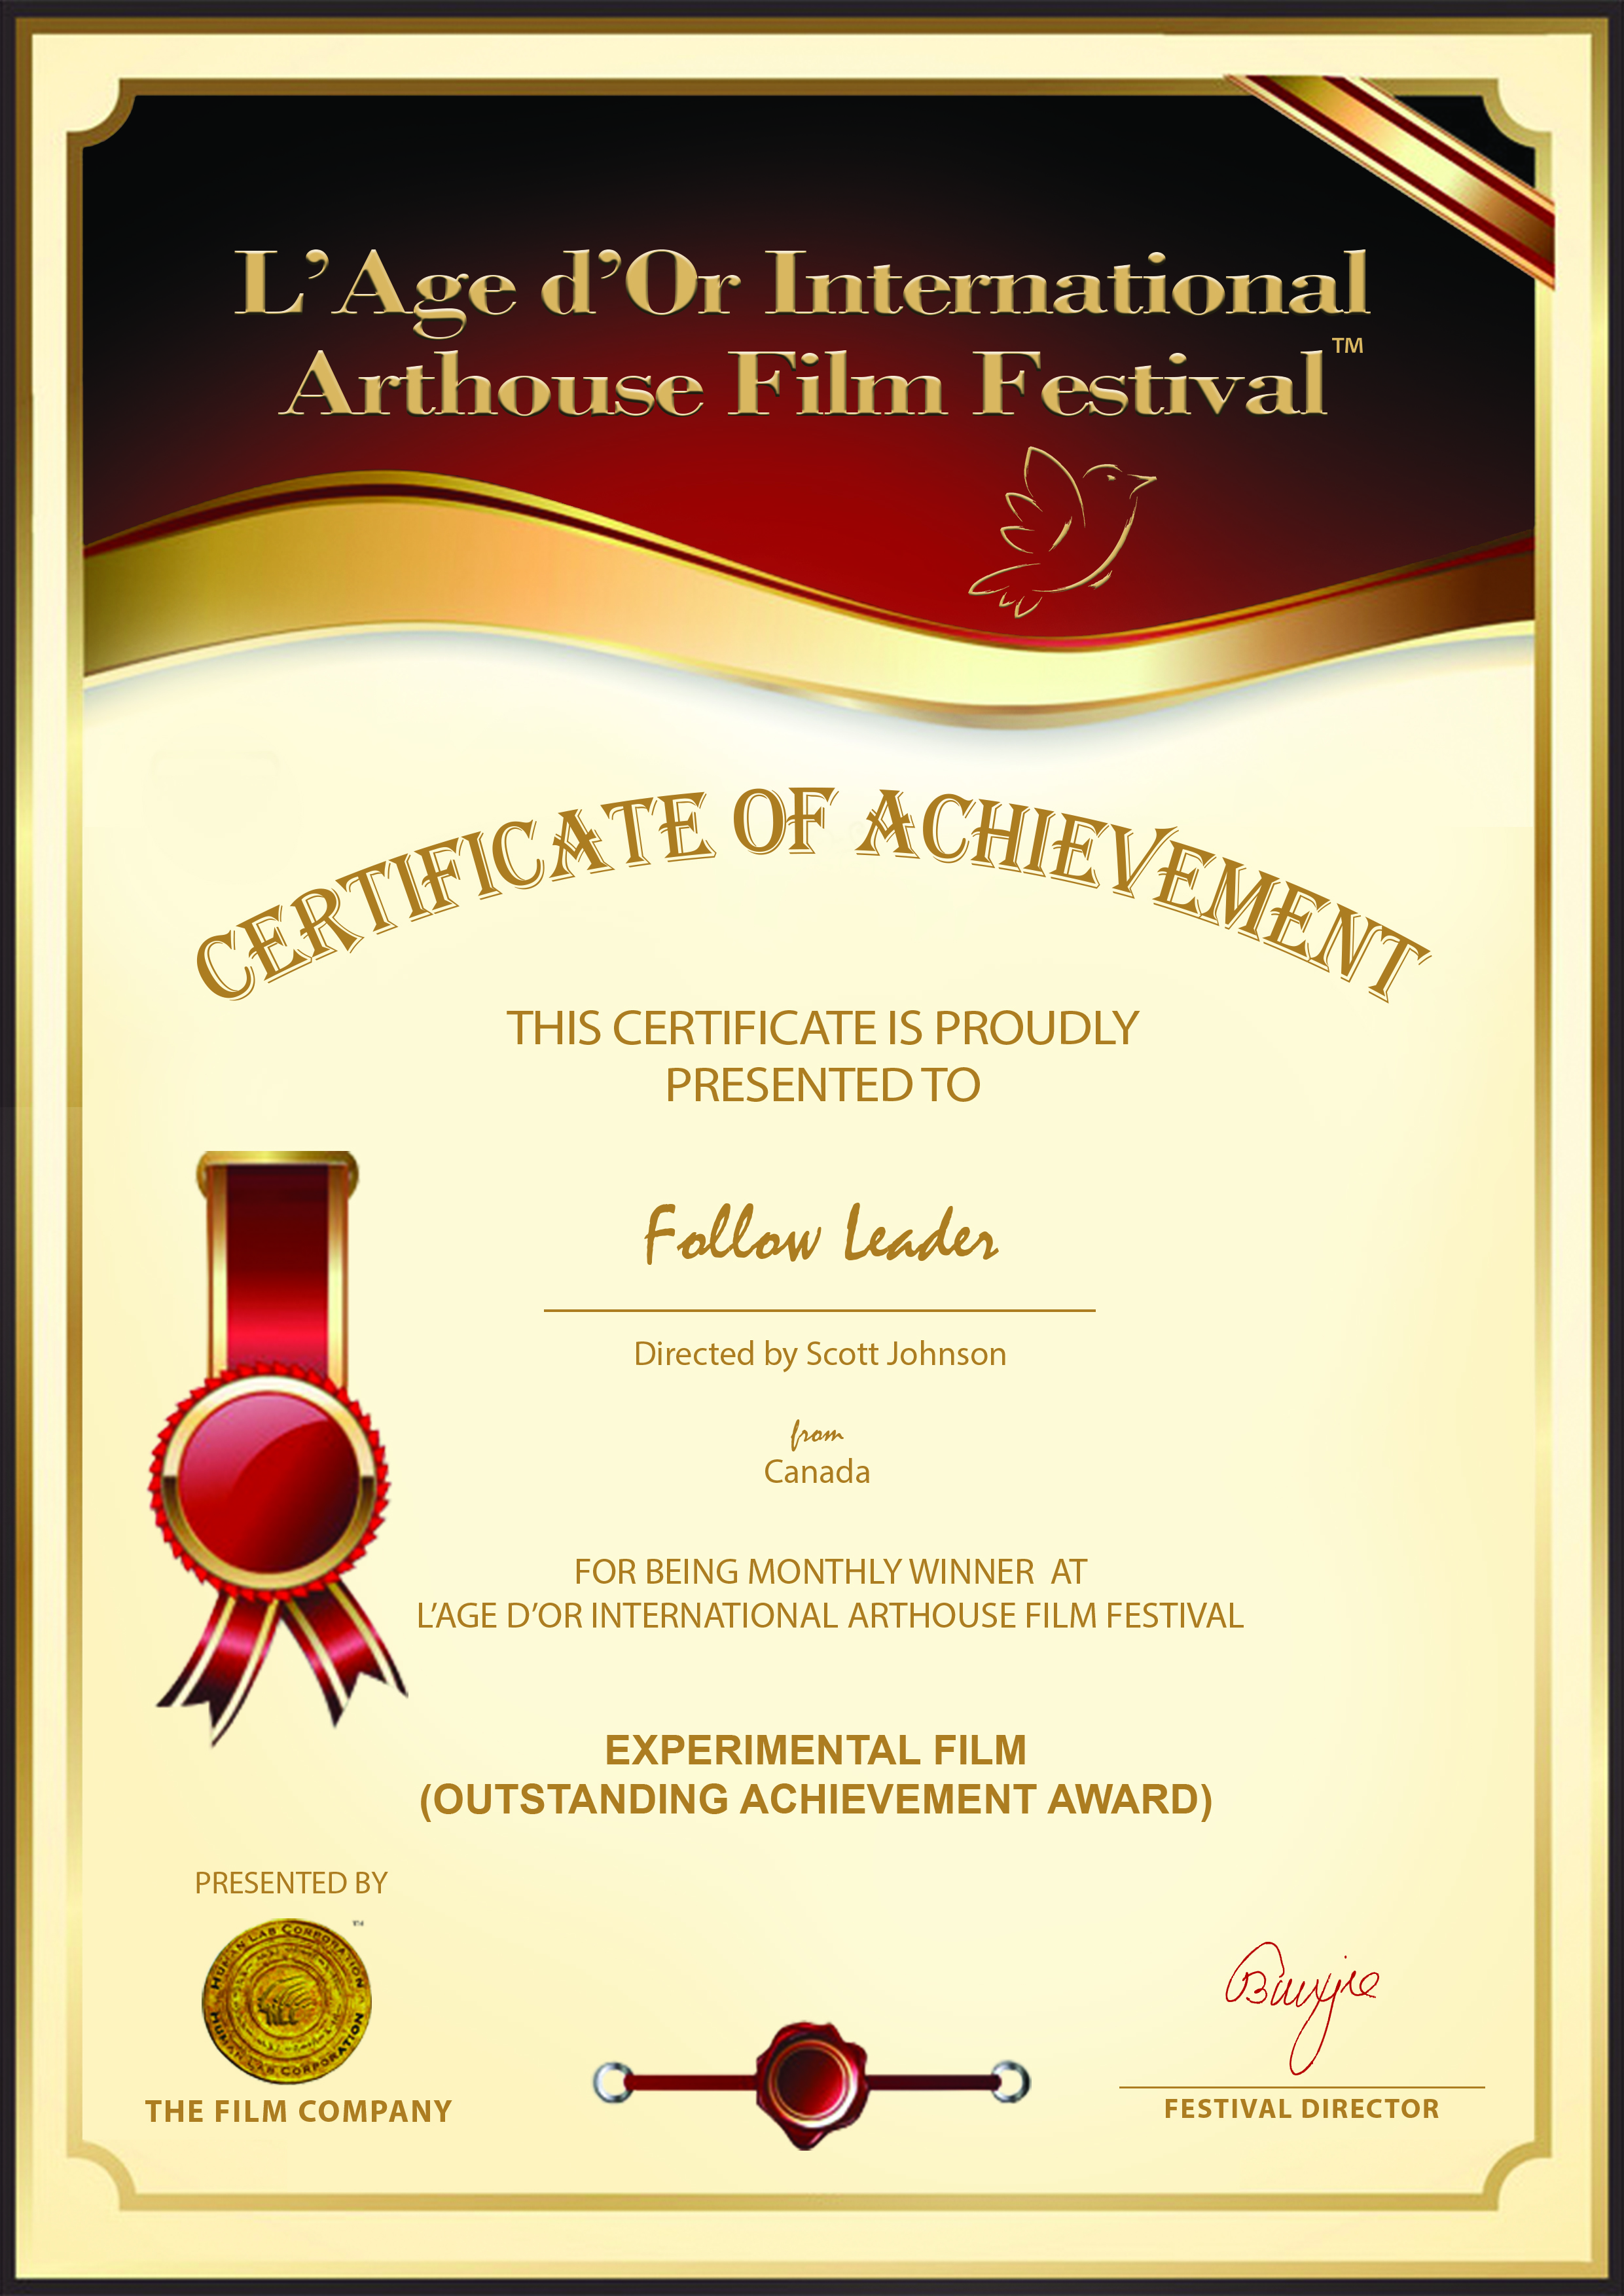 L'Age d'Or International Arthouse Film Festival (LIAFF) - Experimental Film